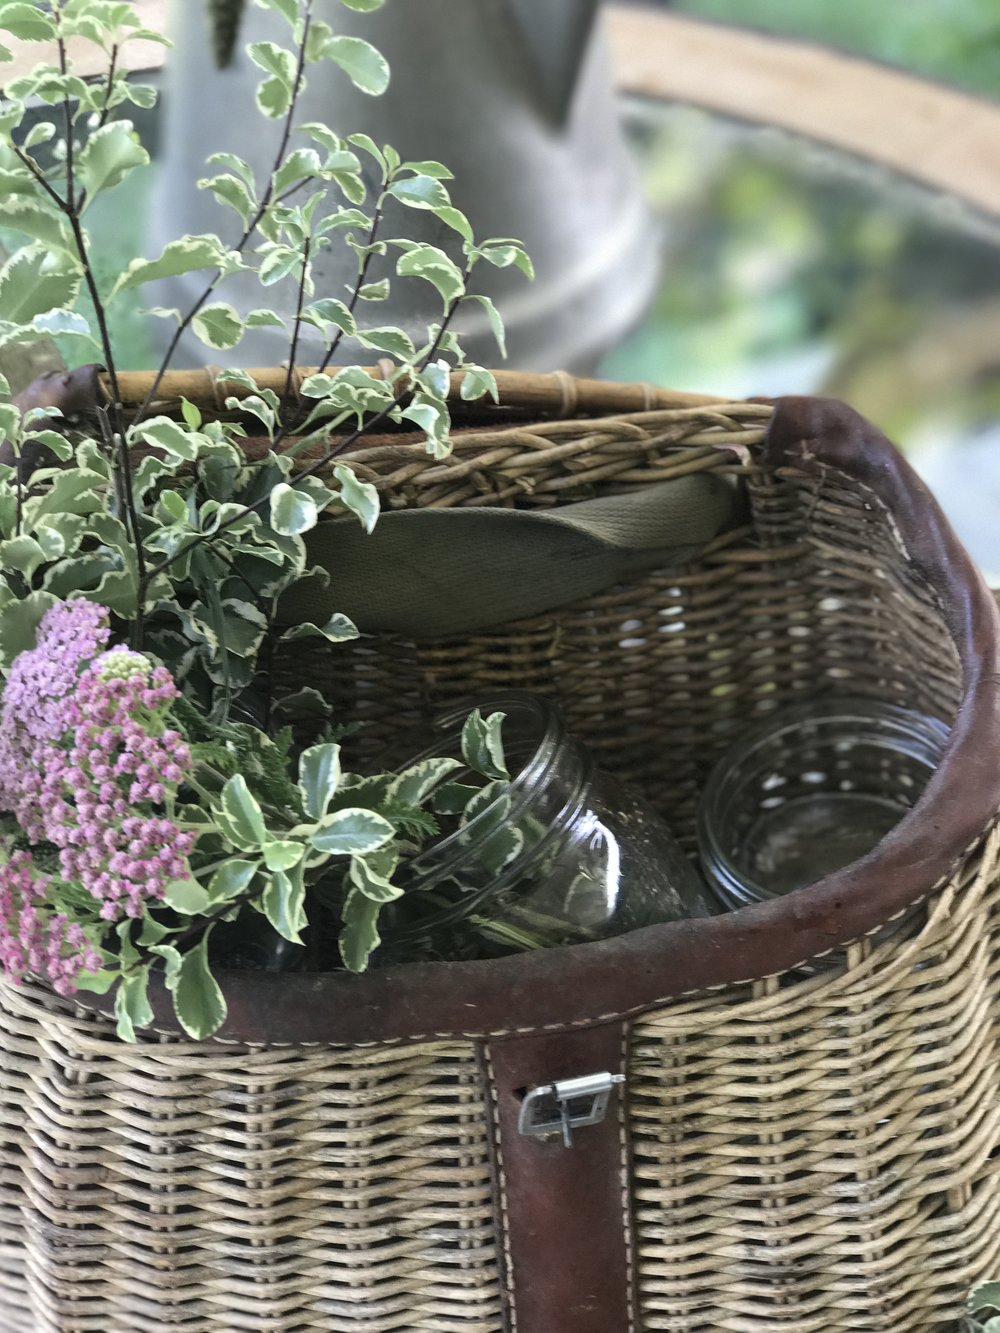 Flowers in a Fishing Basket